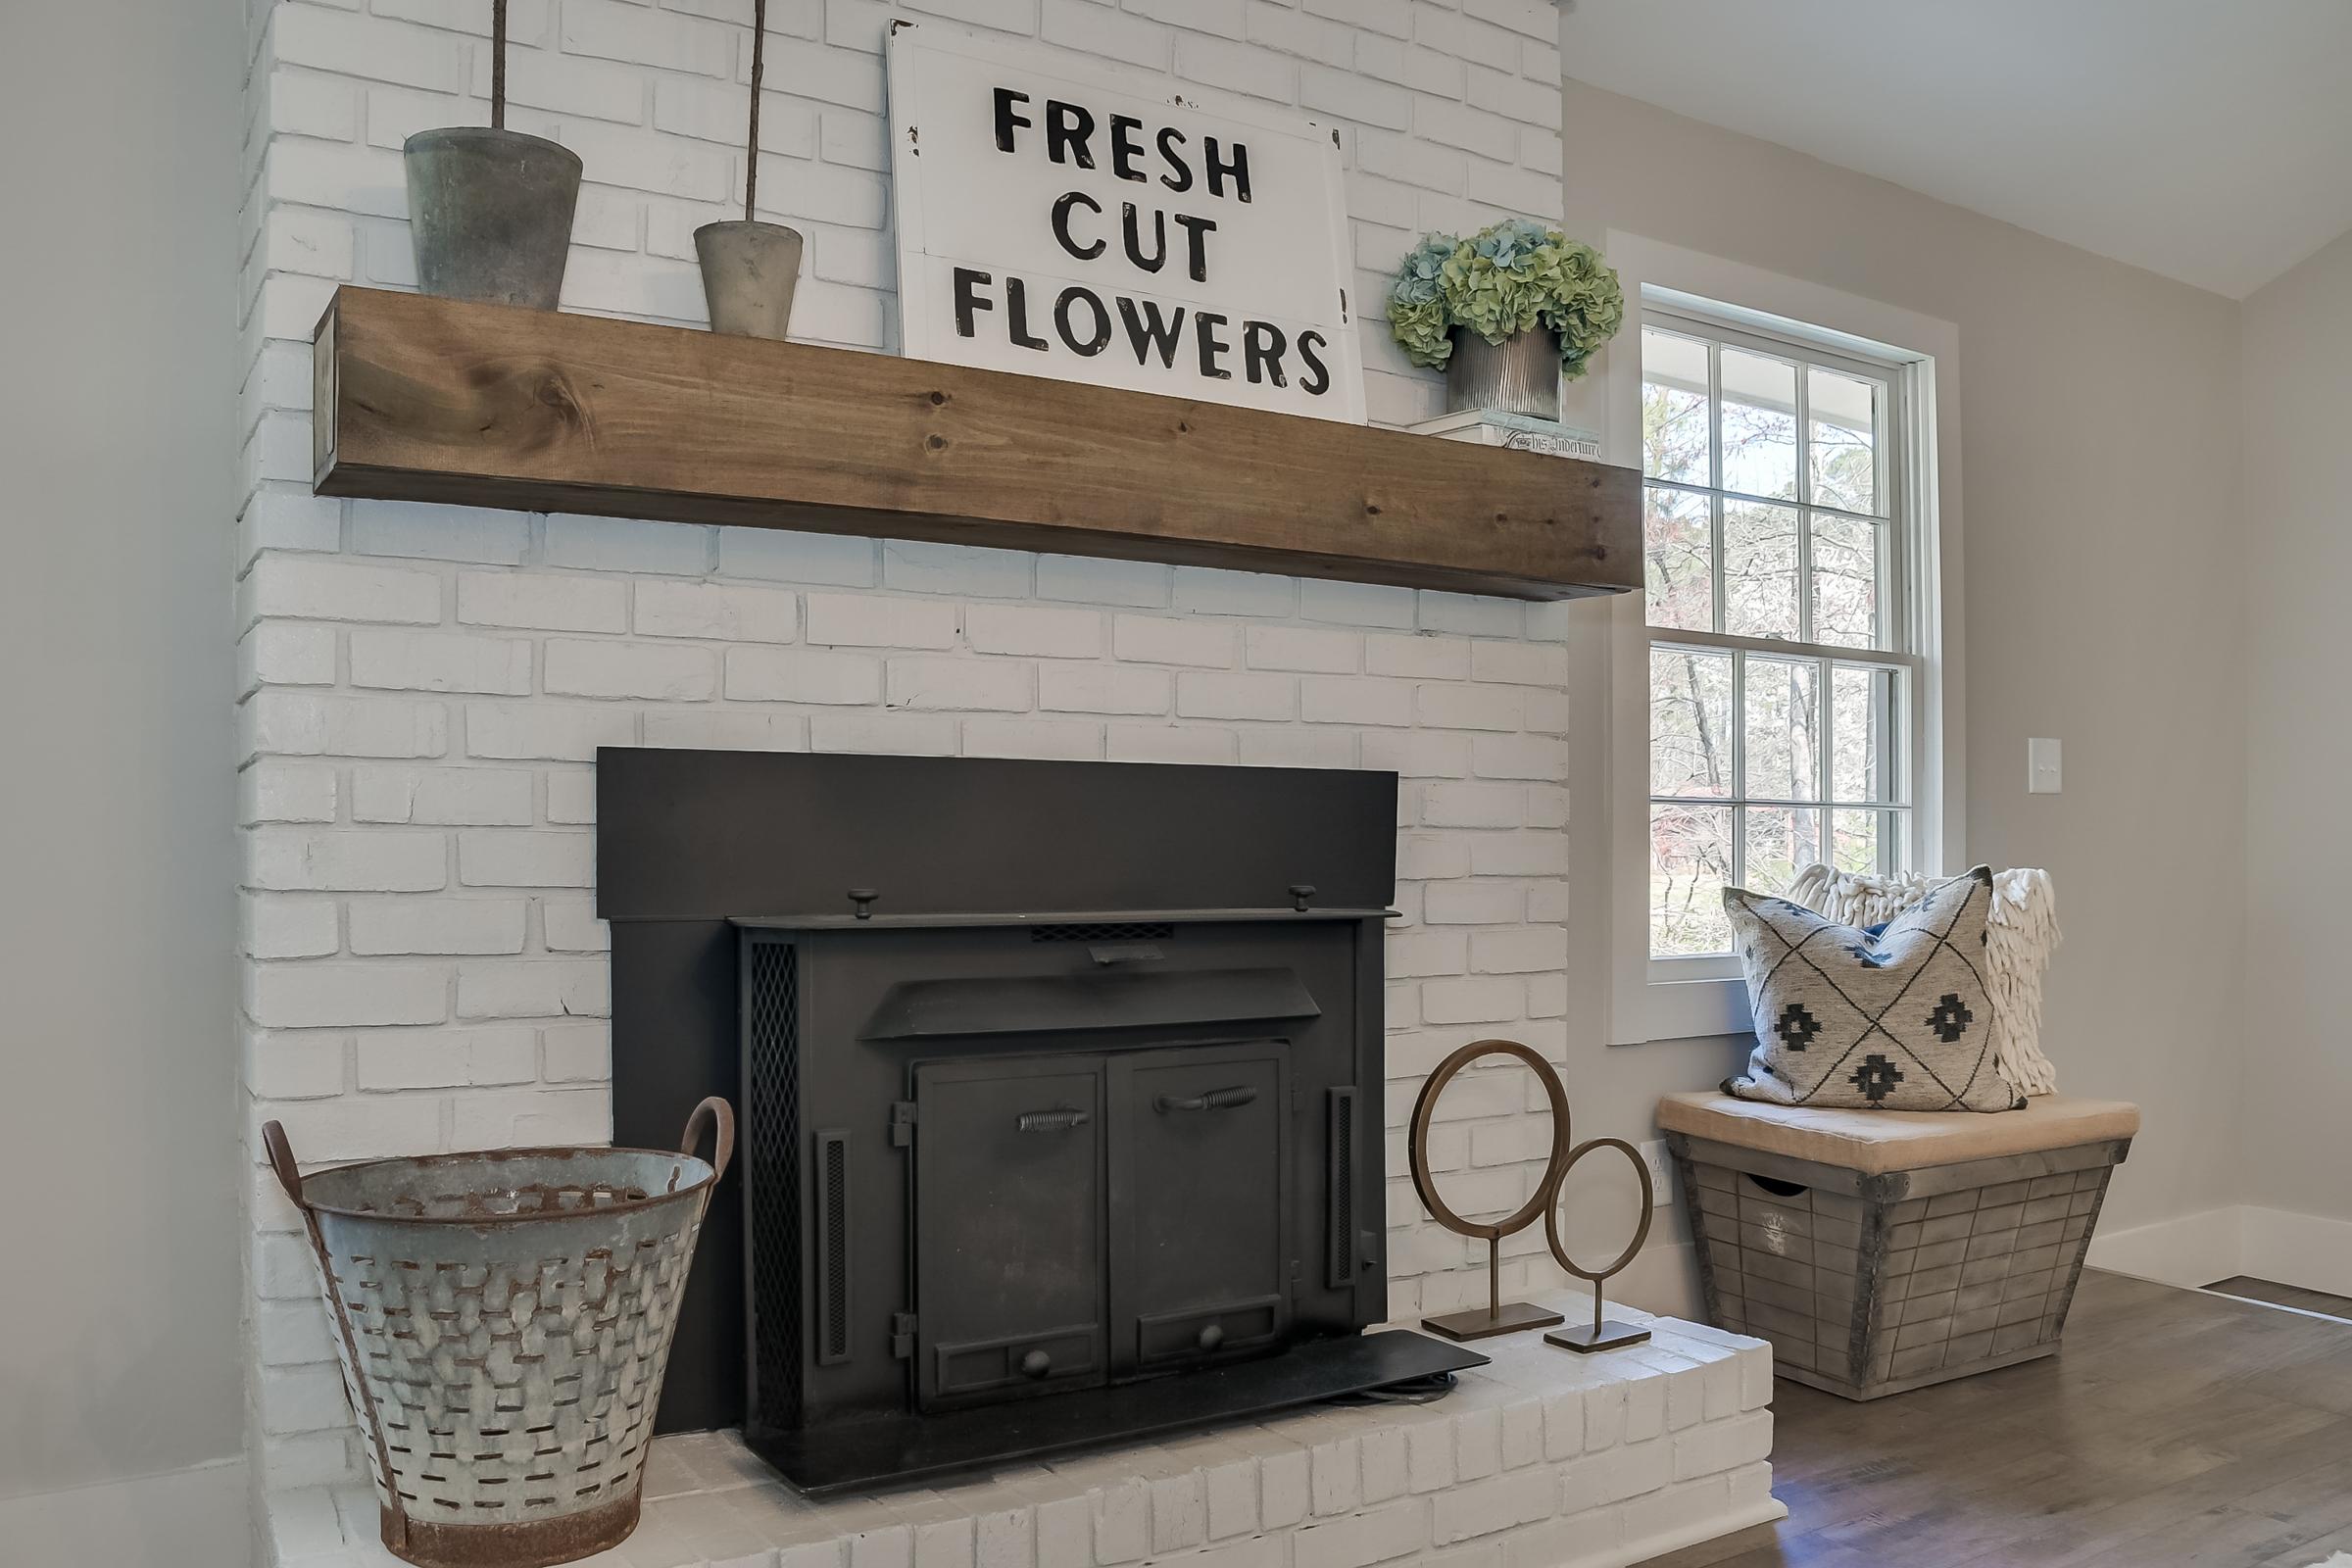 Lighting: Savoy House, Staging: Urban Farmhouse, Flooring: Tarkett, Cabinets: Forevermark Cabinetry